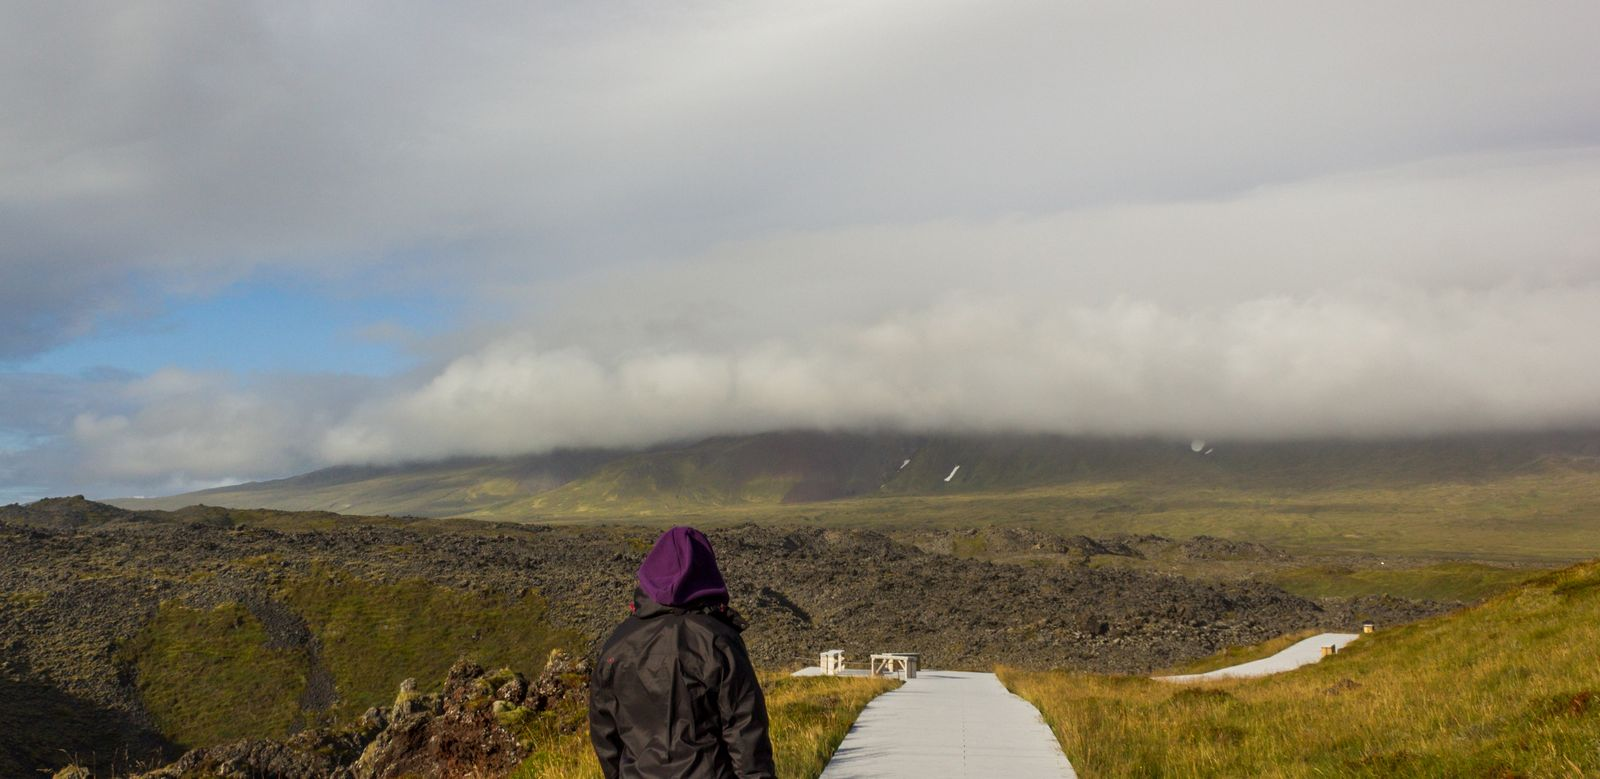 Ahí está, supuestamente, el volcán Snaefellsjökull